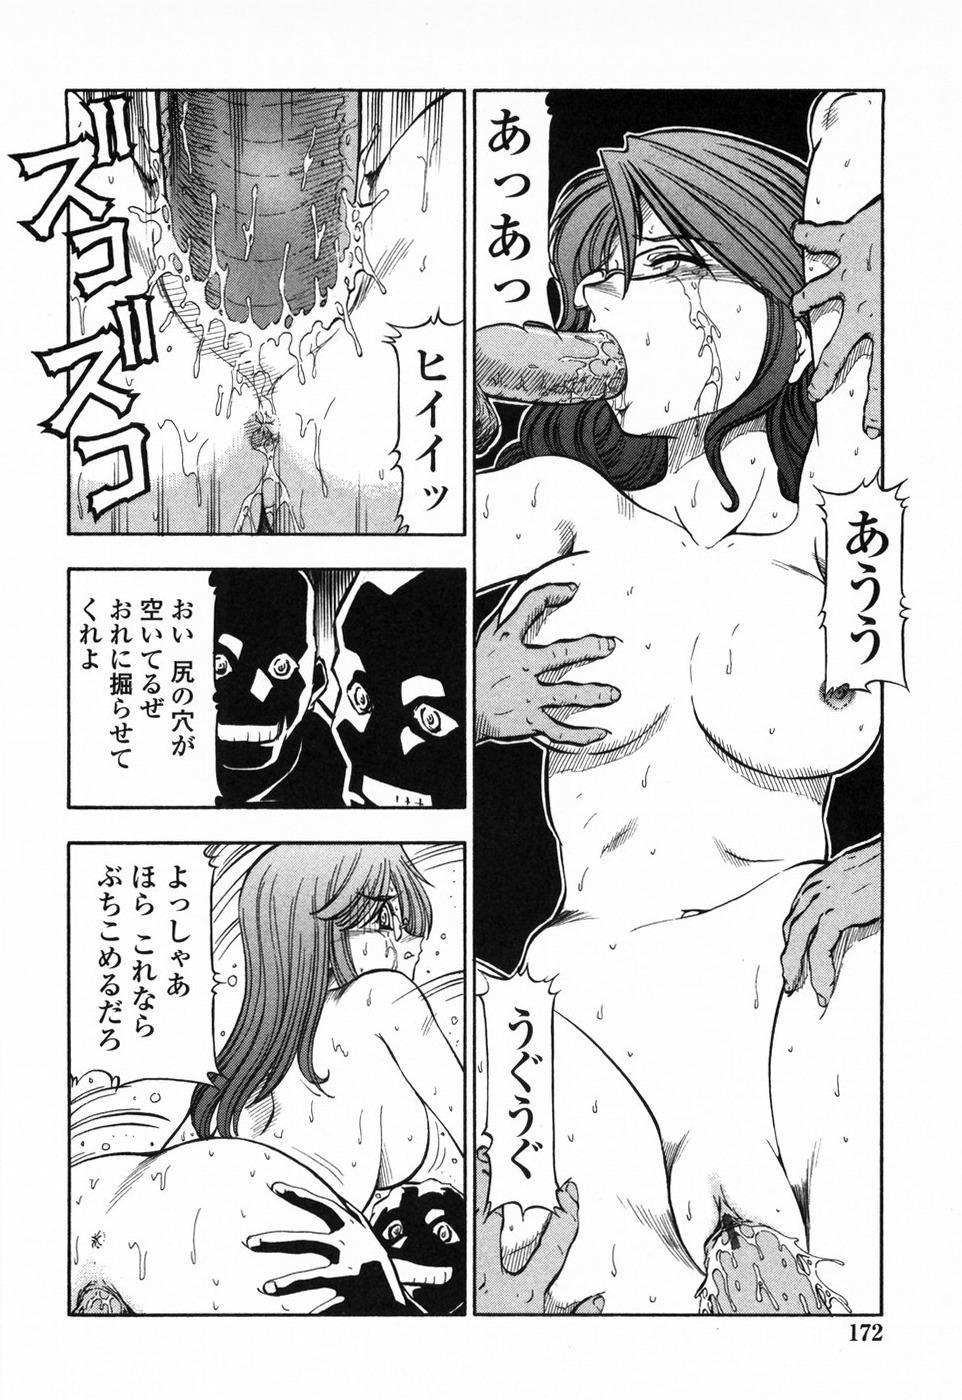 Kichiku Houteishiki - Equation of brutal person 178